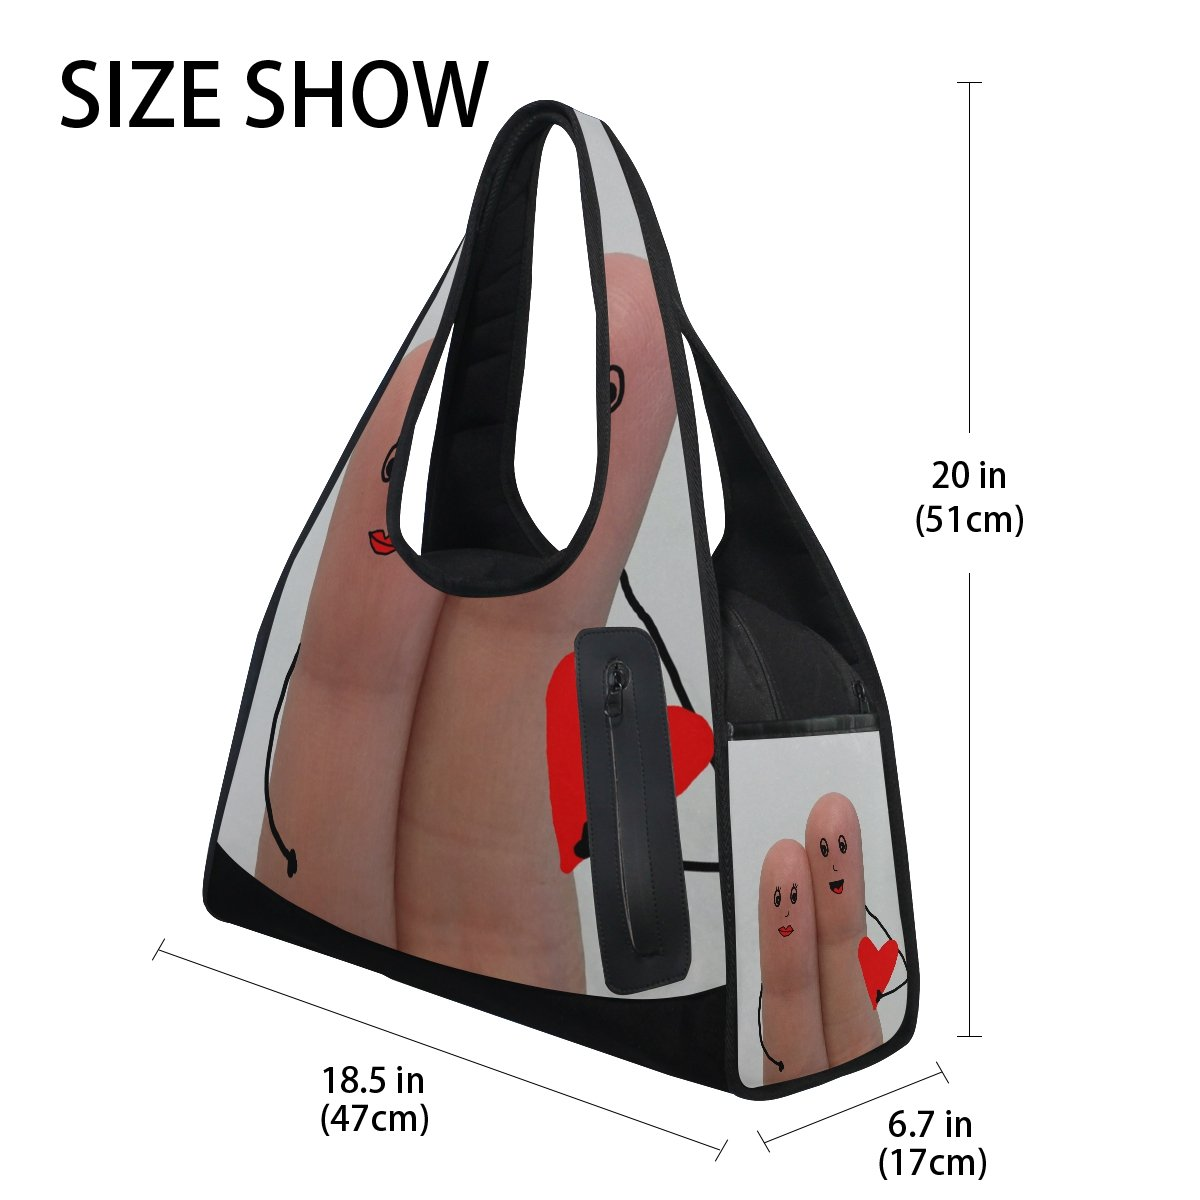 AHOMY Sports Gym Bag Love Marriage Duffel Bag Travel Shoulder Bag by AHOMY (Image #4)